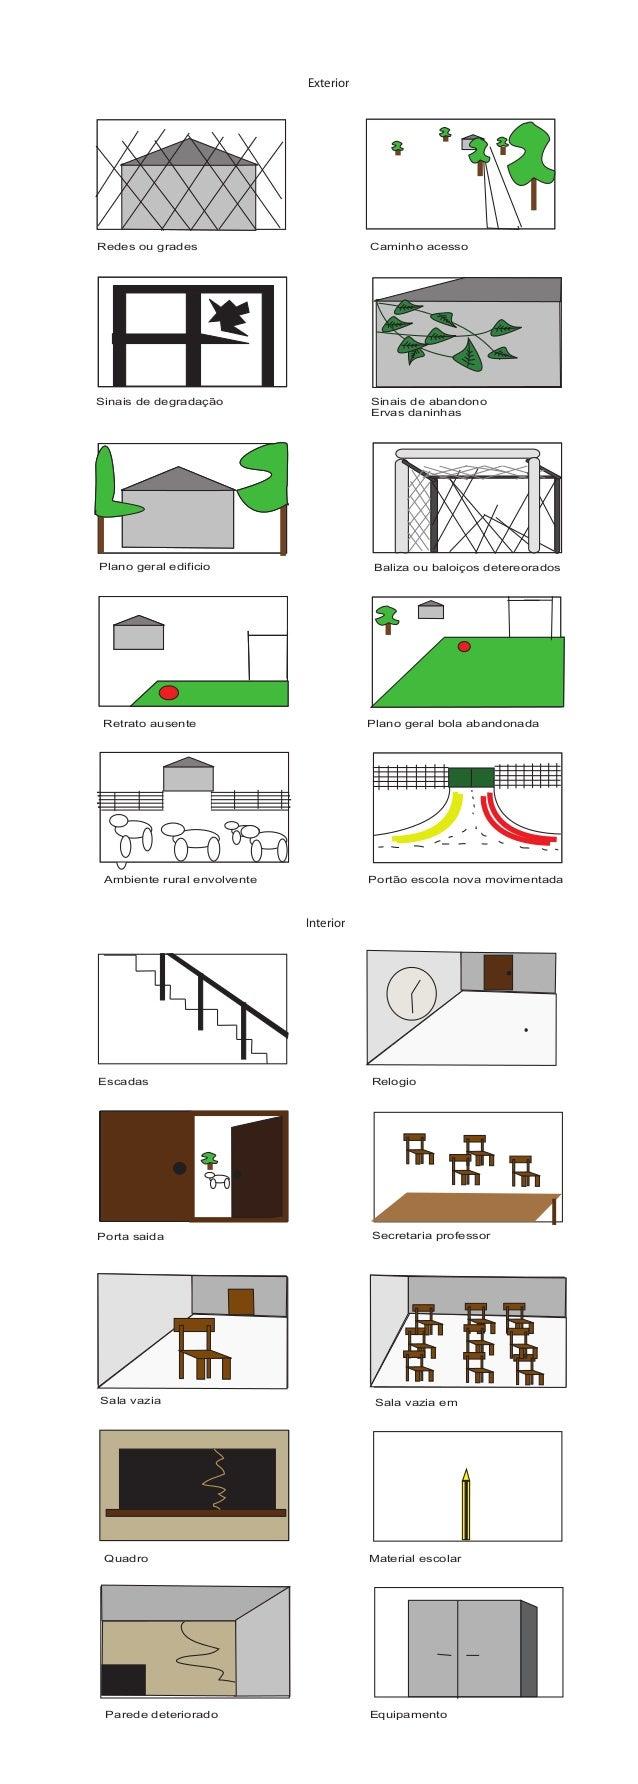 Redes ou grades Sinais de abandono Ervas daninhas Sinais de degradação Baliza ou baloiços detereoradosPlano geral edificio...